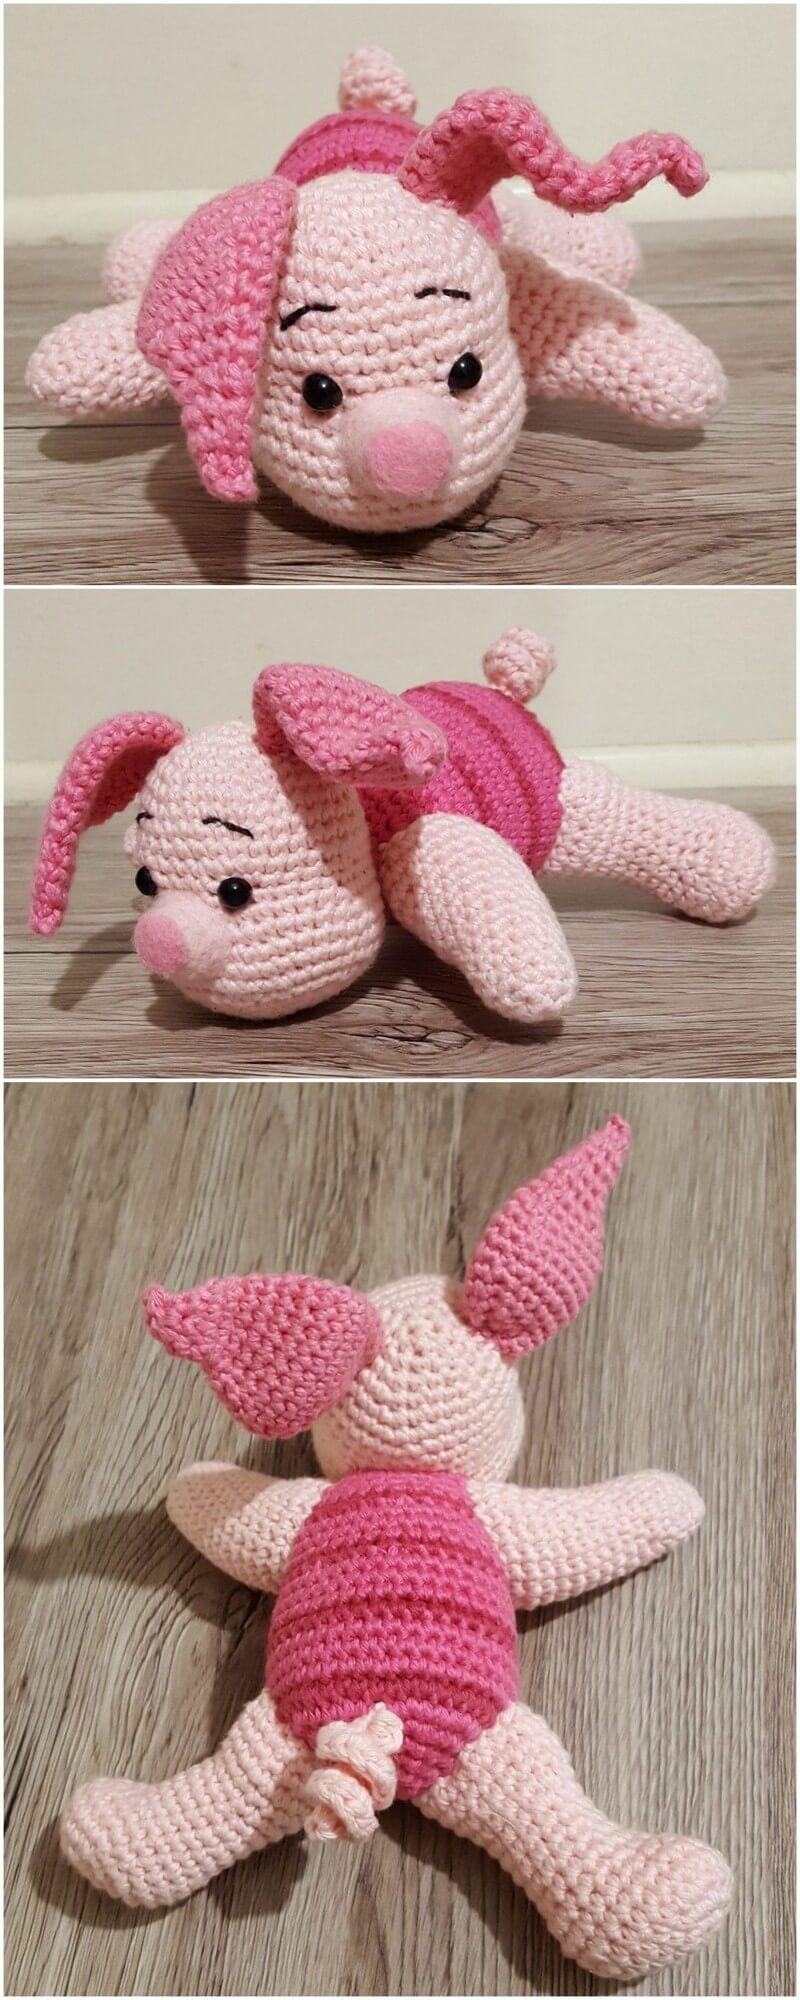 Free Crochet Amigurumi Pattern (13)